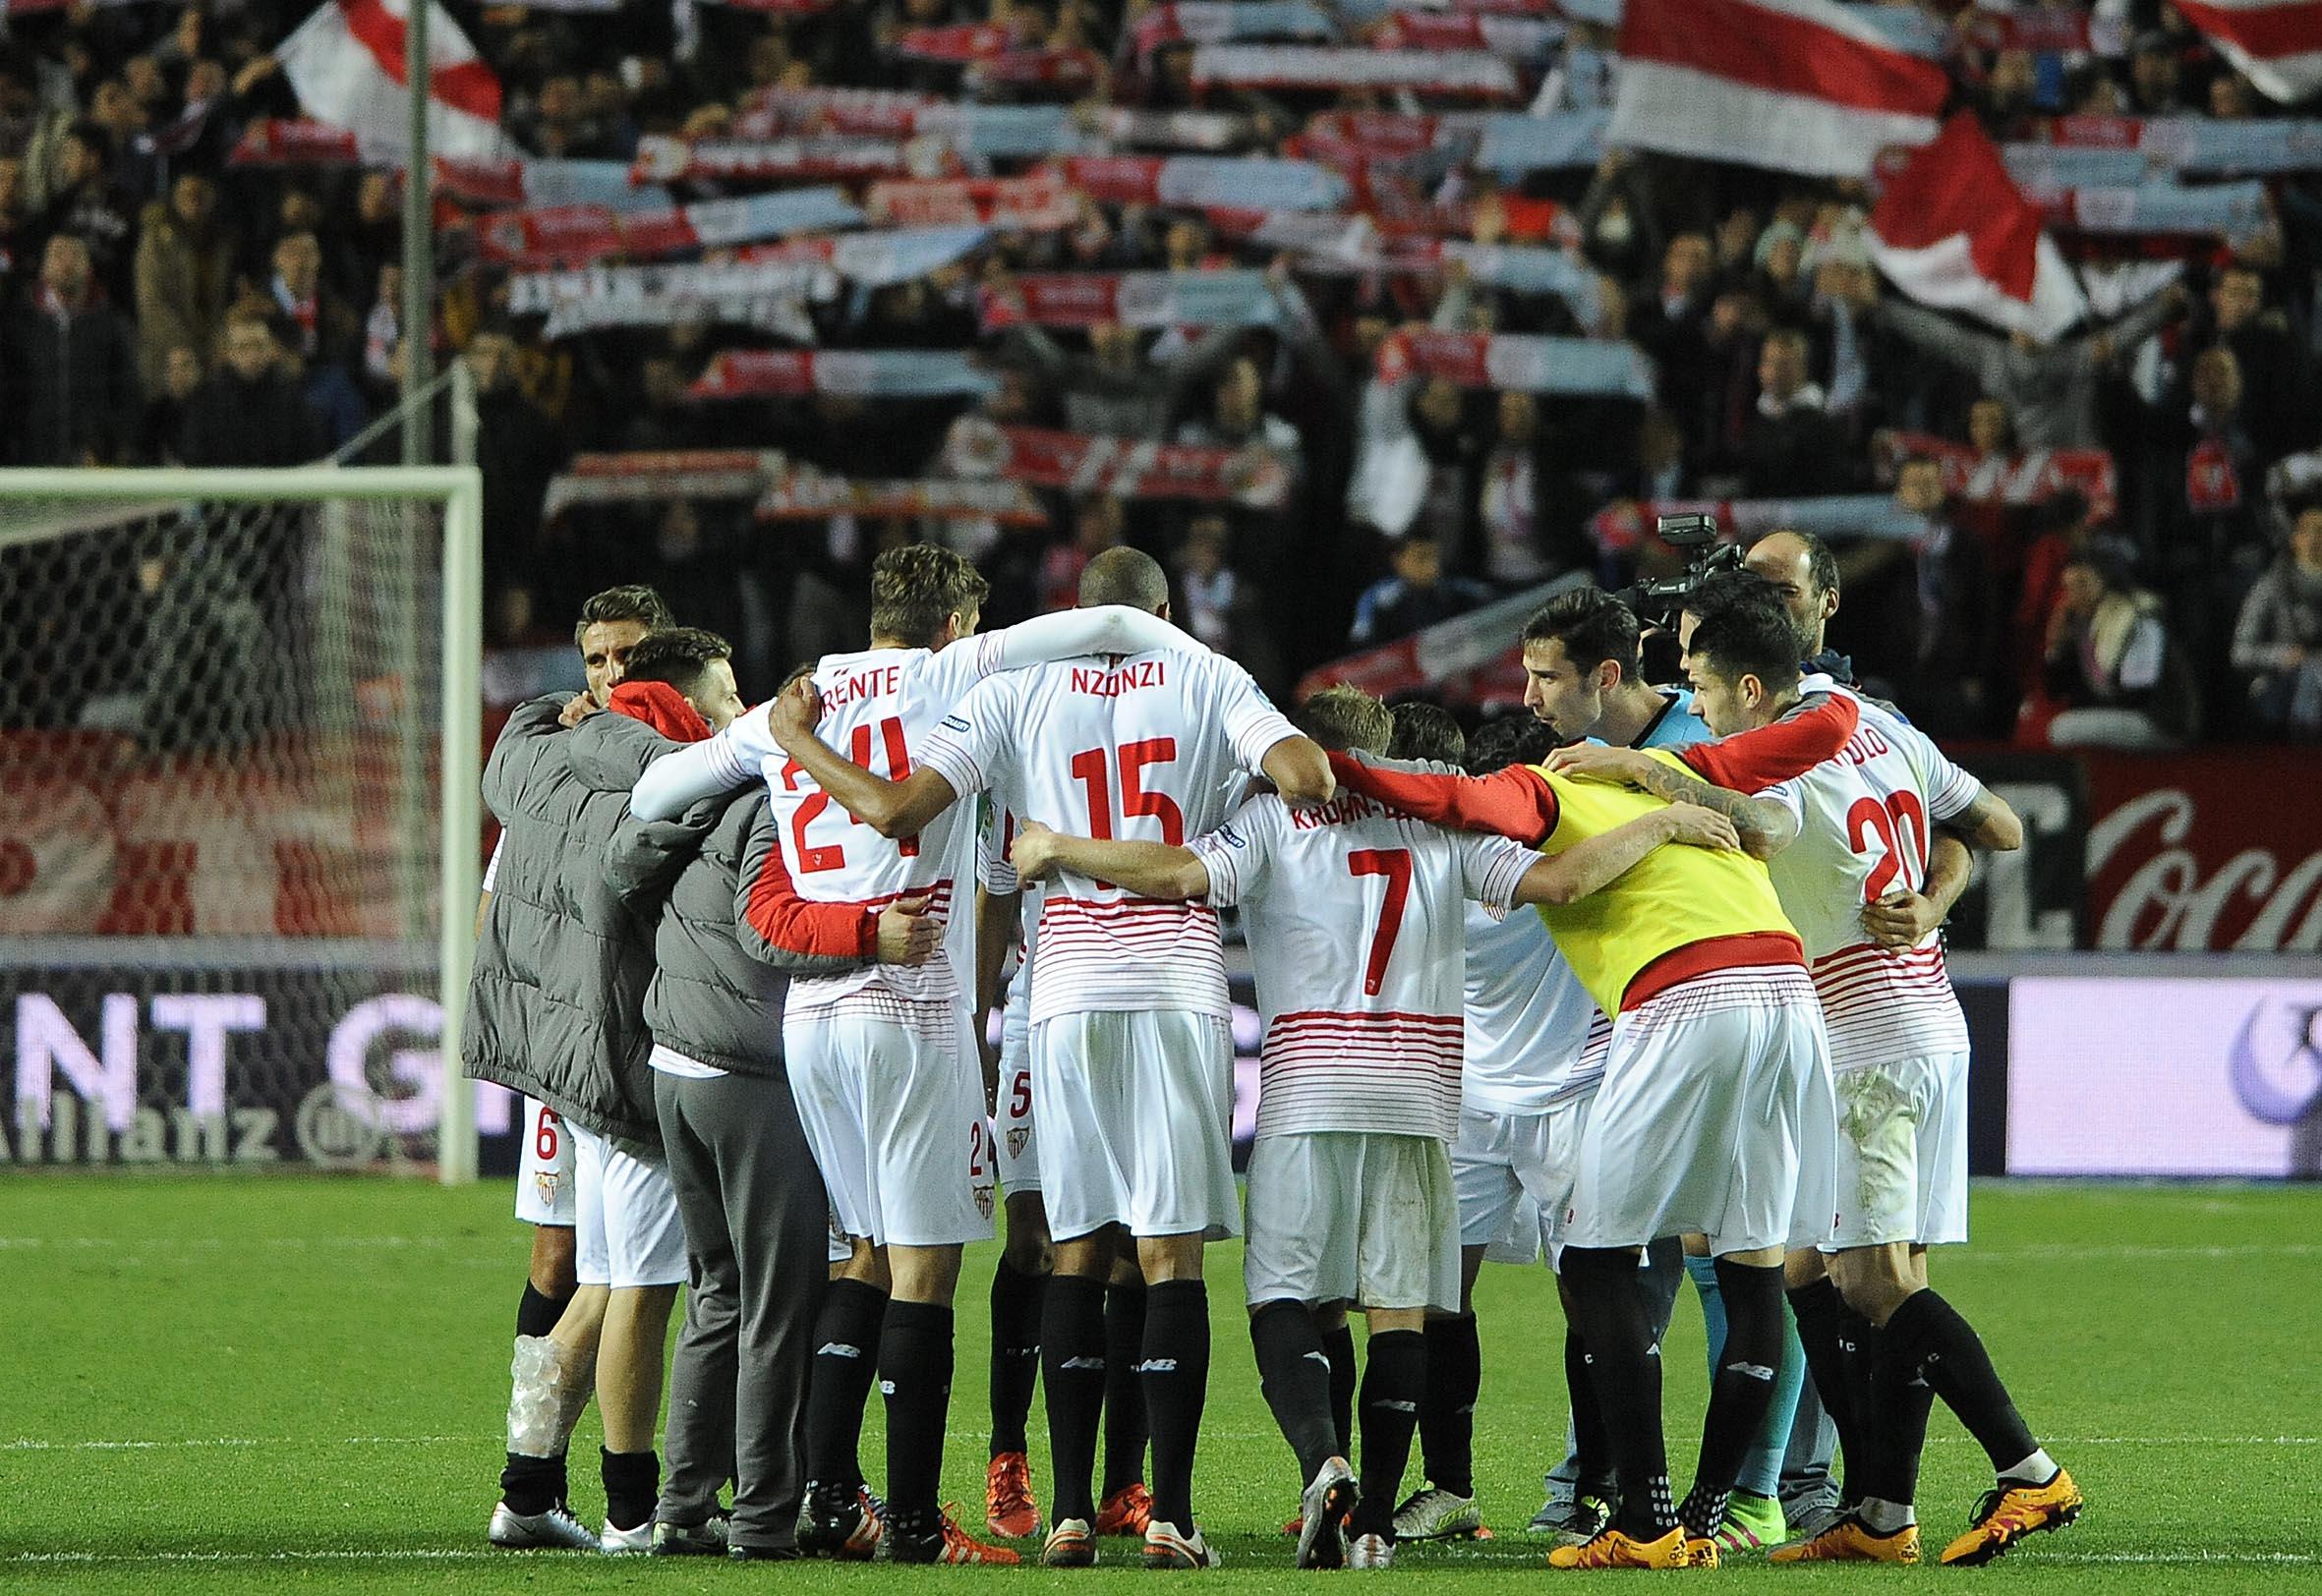 Piña en el Sevilla FC-Celta